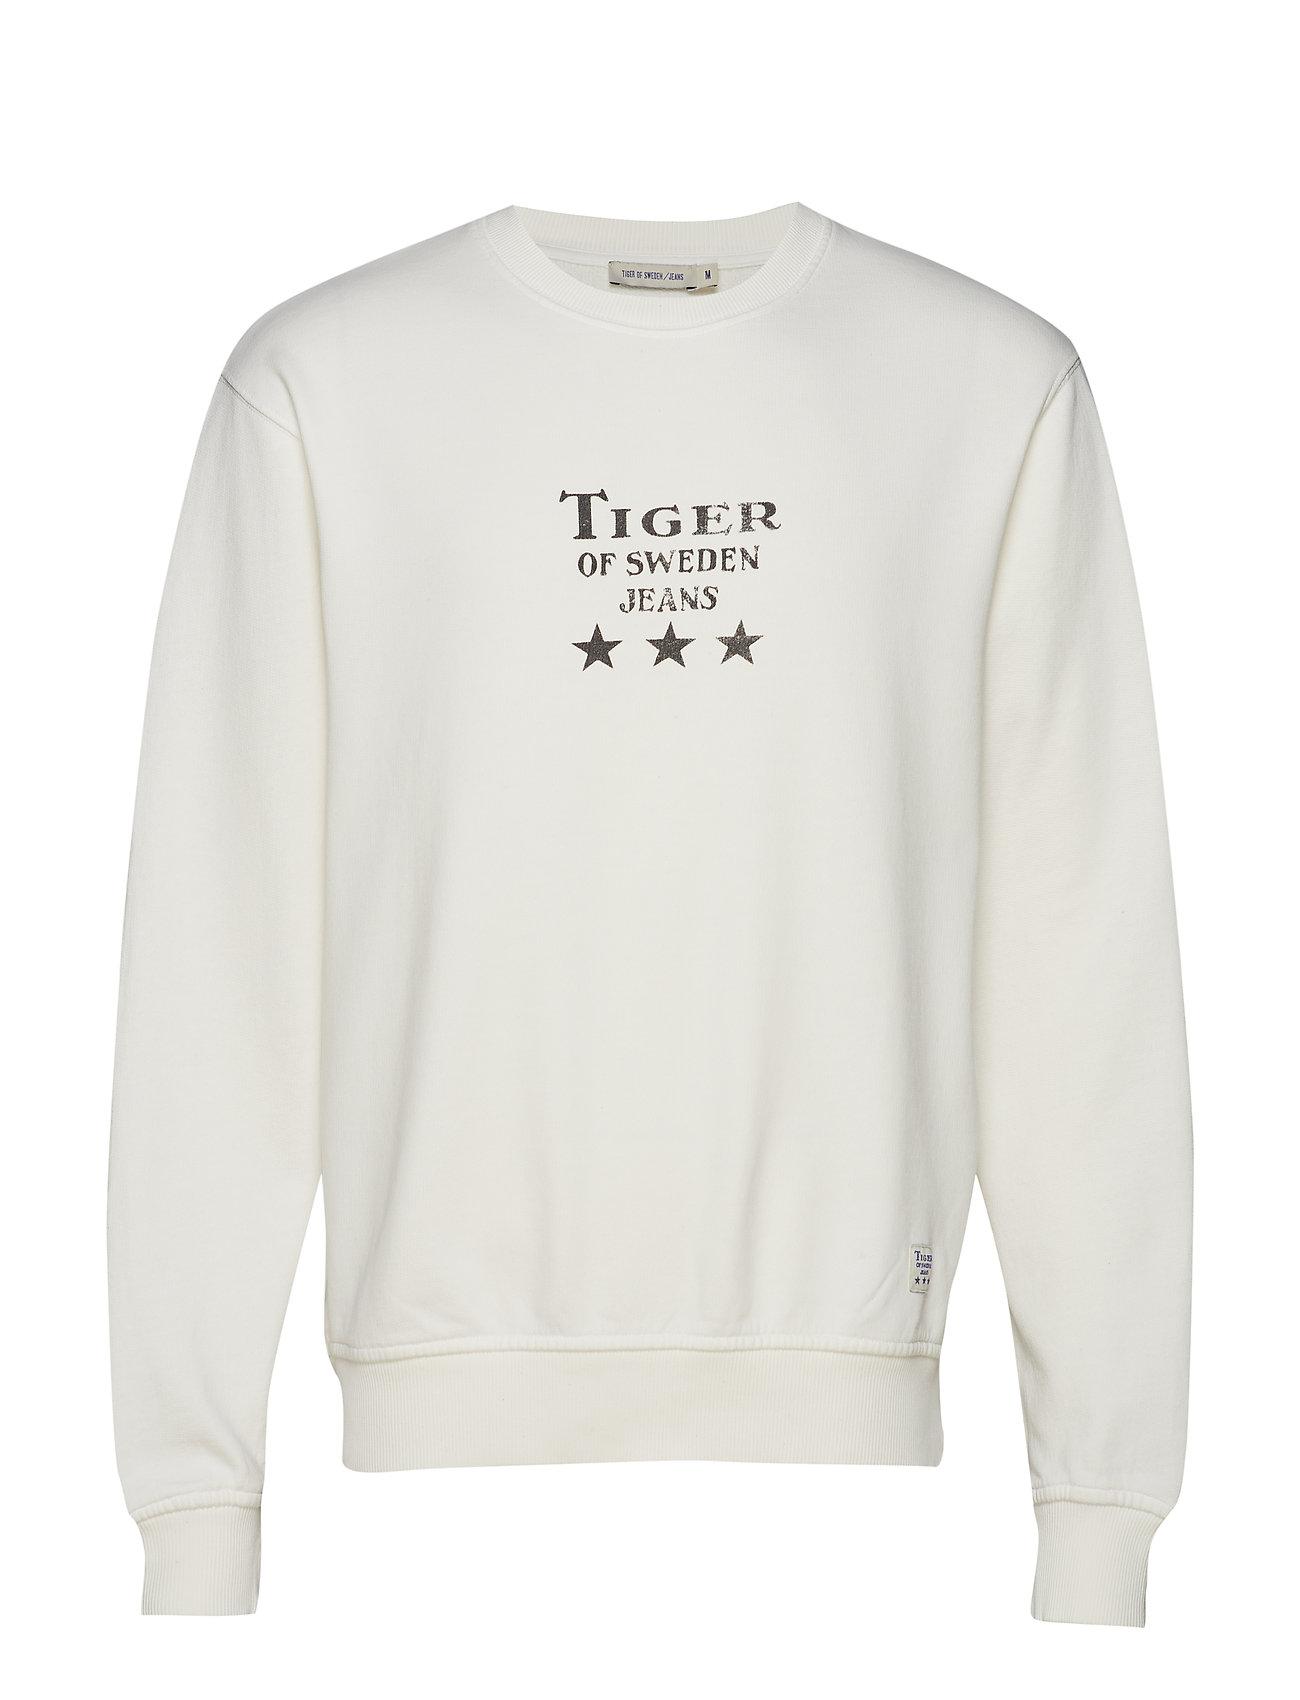 TIGER OF SWEDEN Tana O Sweat-shirt Pullover Weiß TIGER OF SWEDEN JEANS